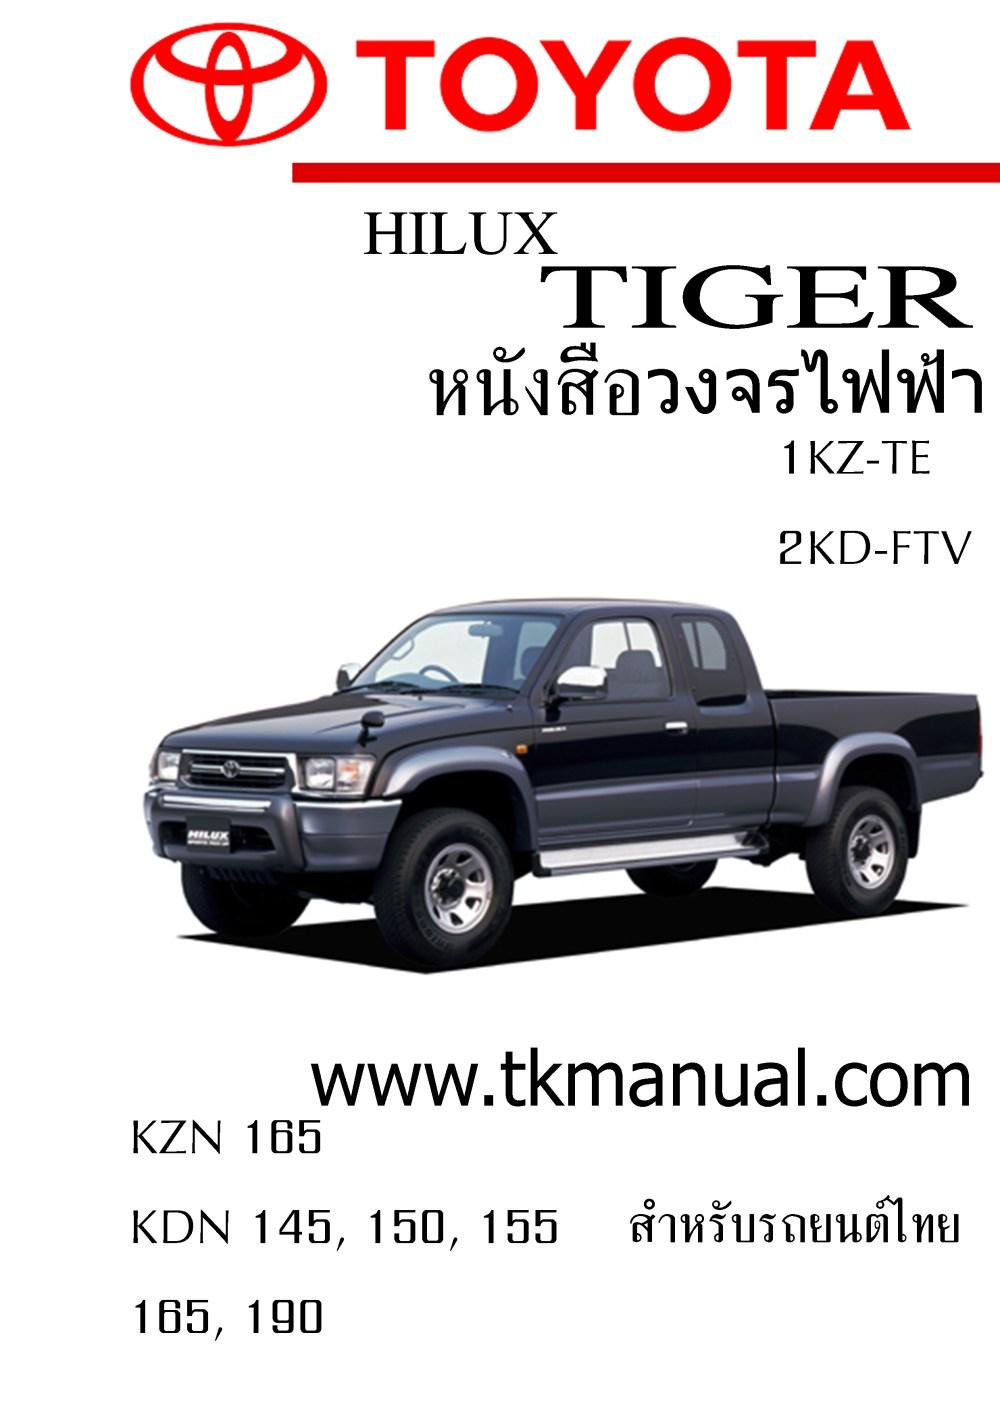 medium resolution of diagram wiring diagram tiger d4d full version hd quality tiger d4d toyota hilux d4d wiring